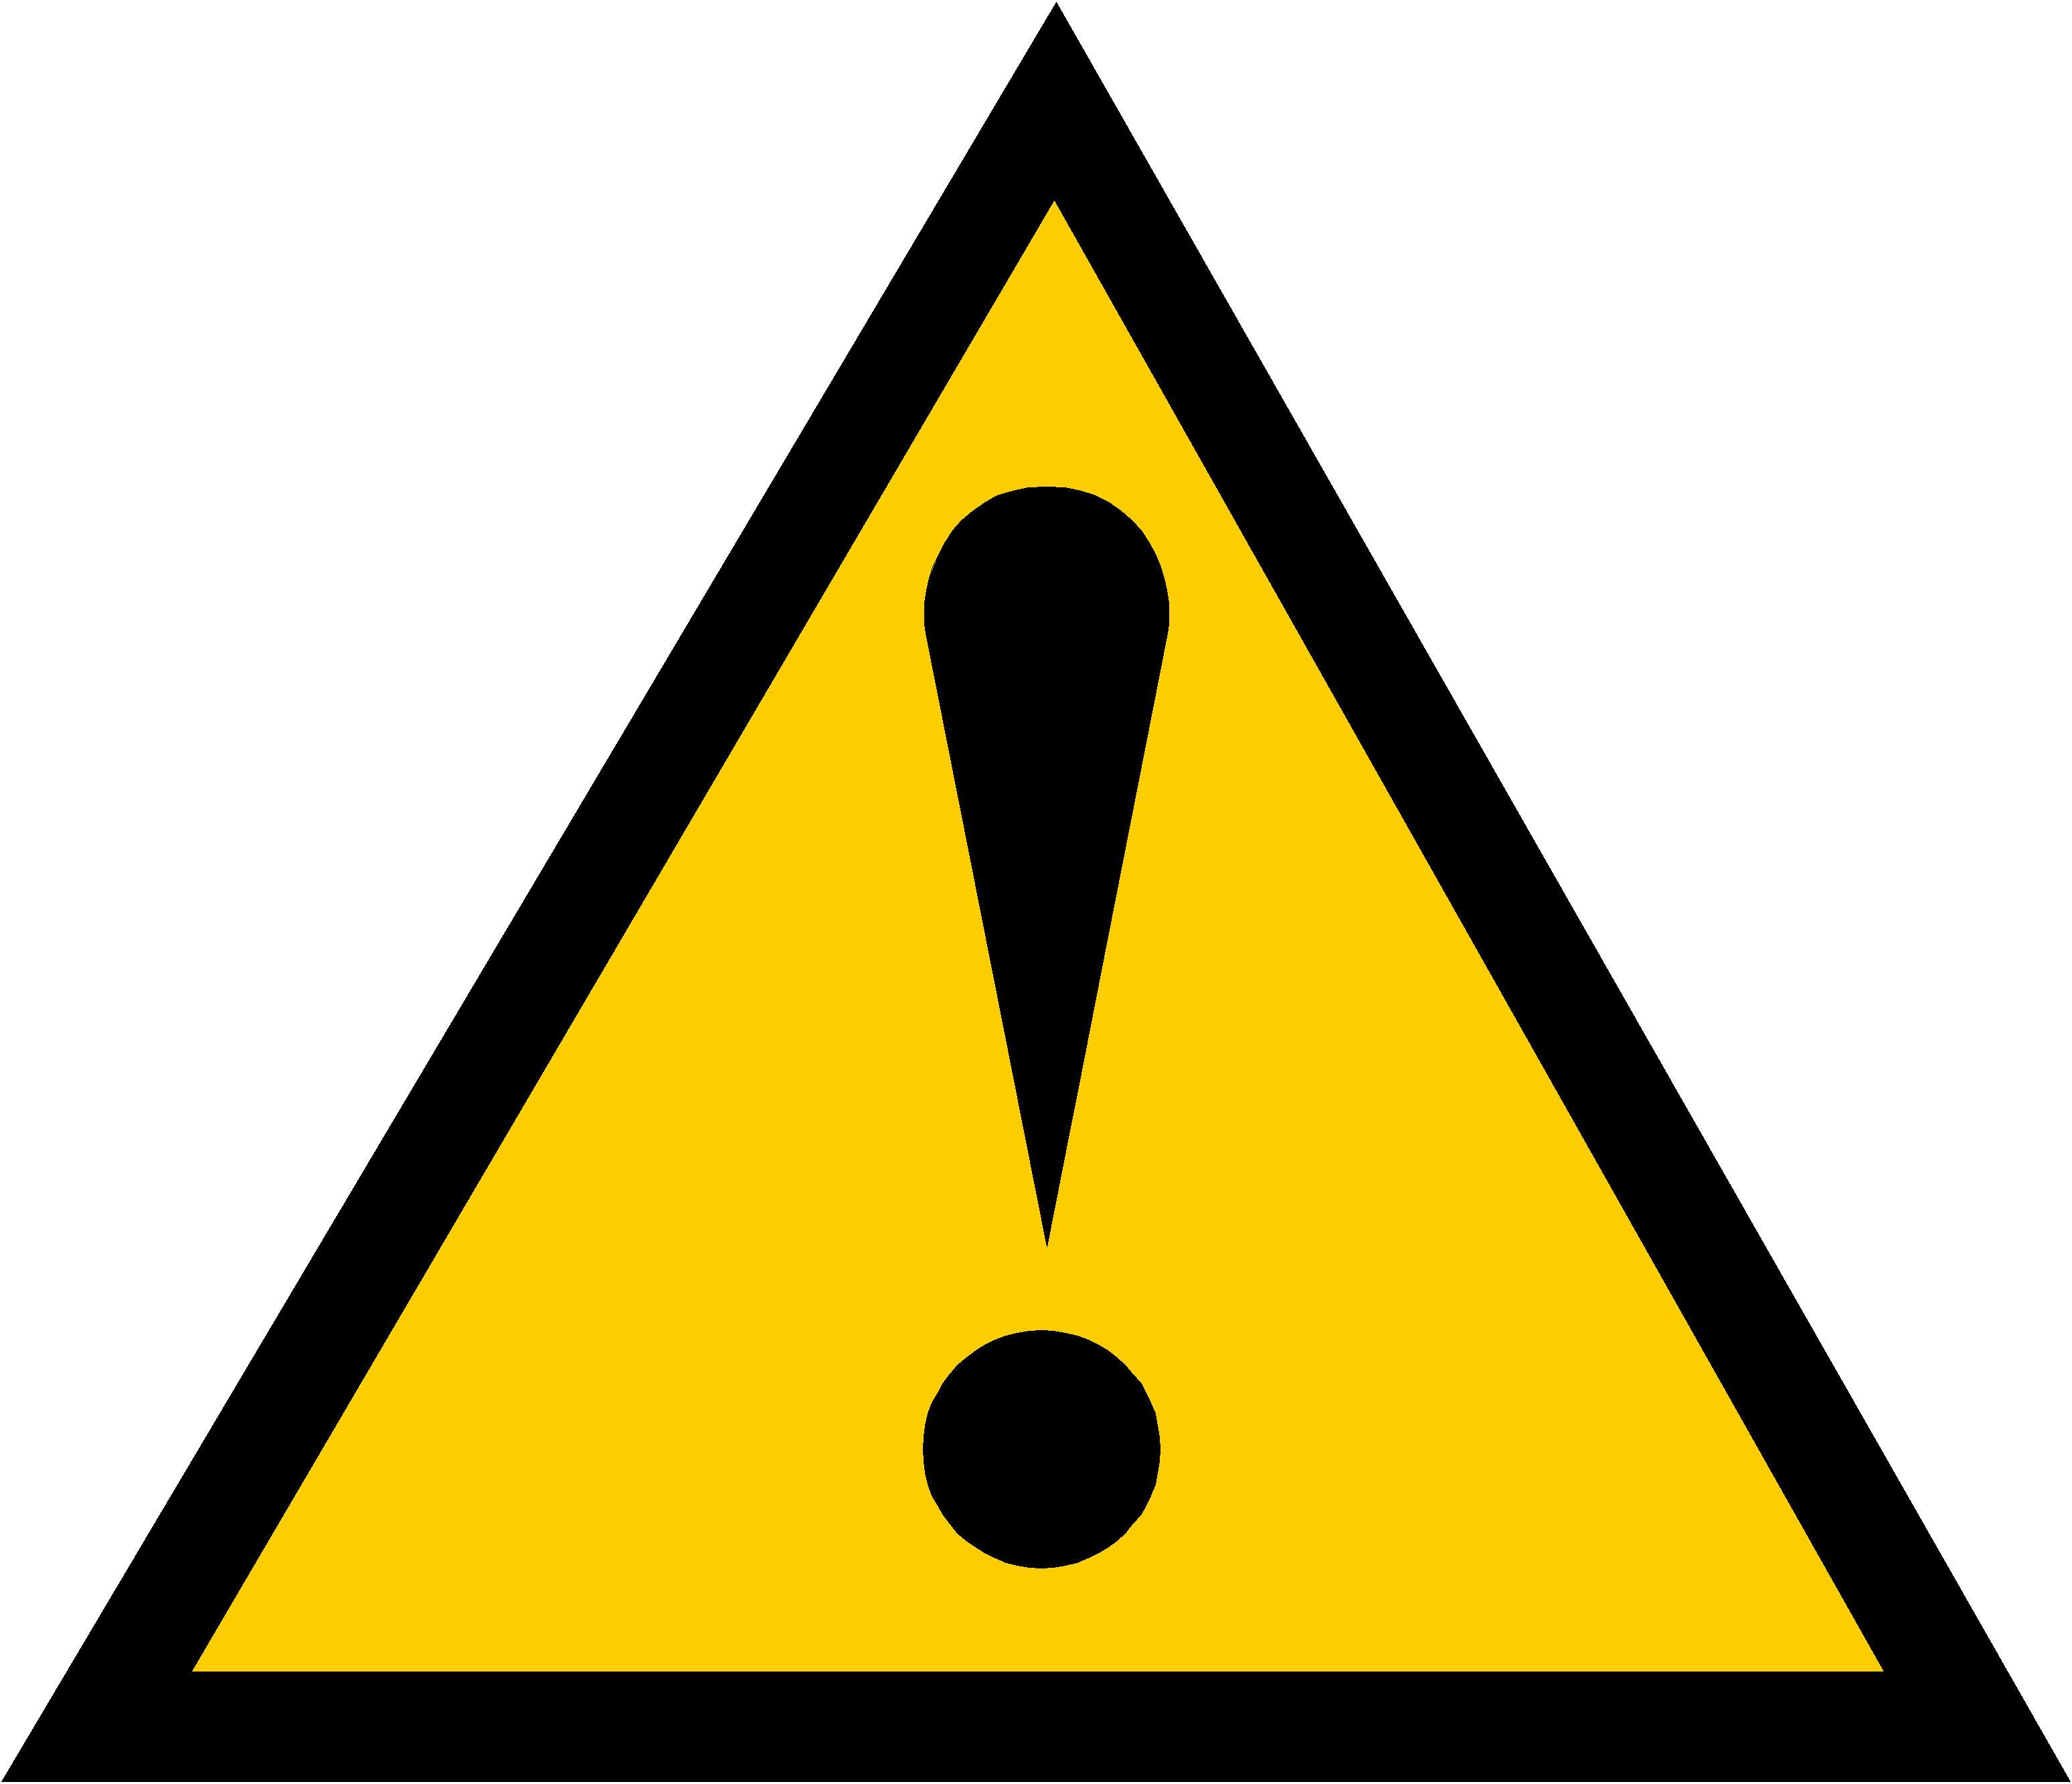 caution-004